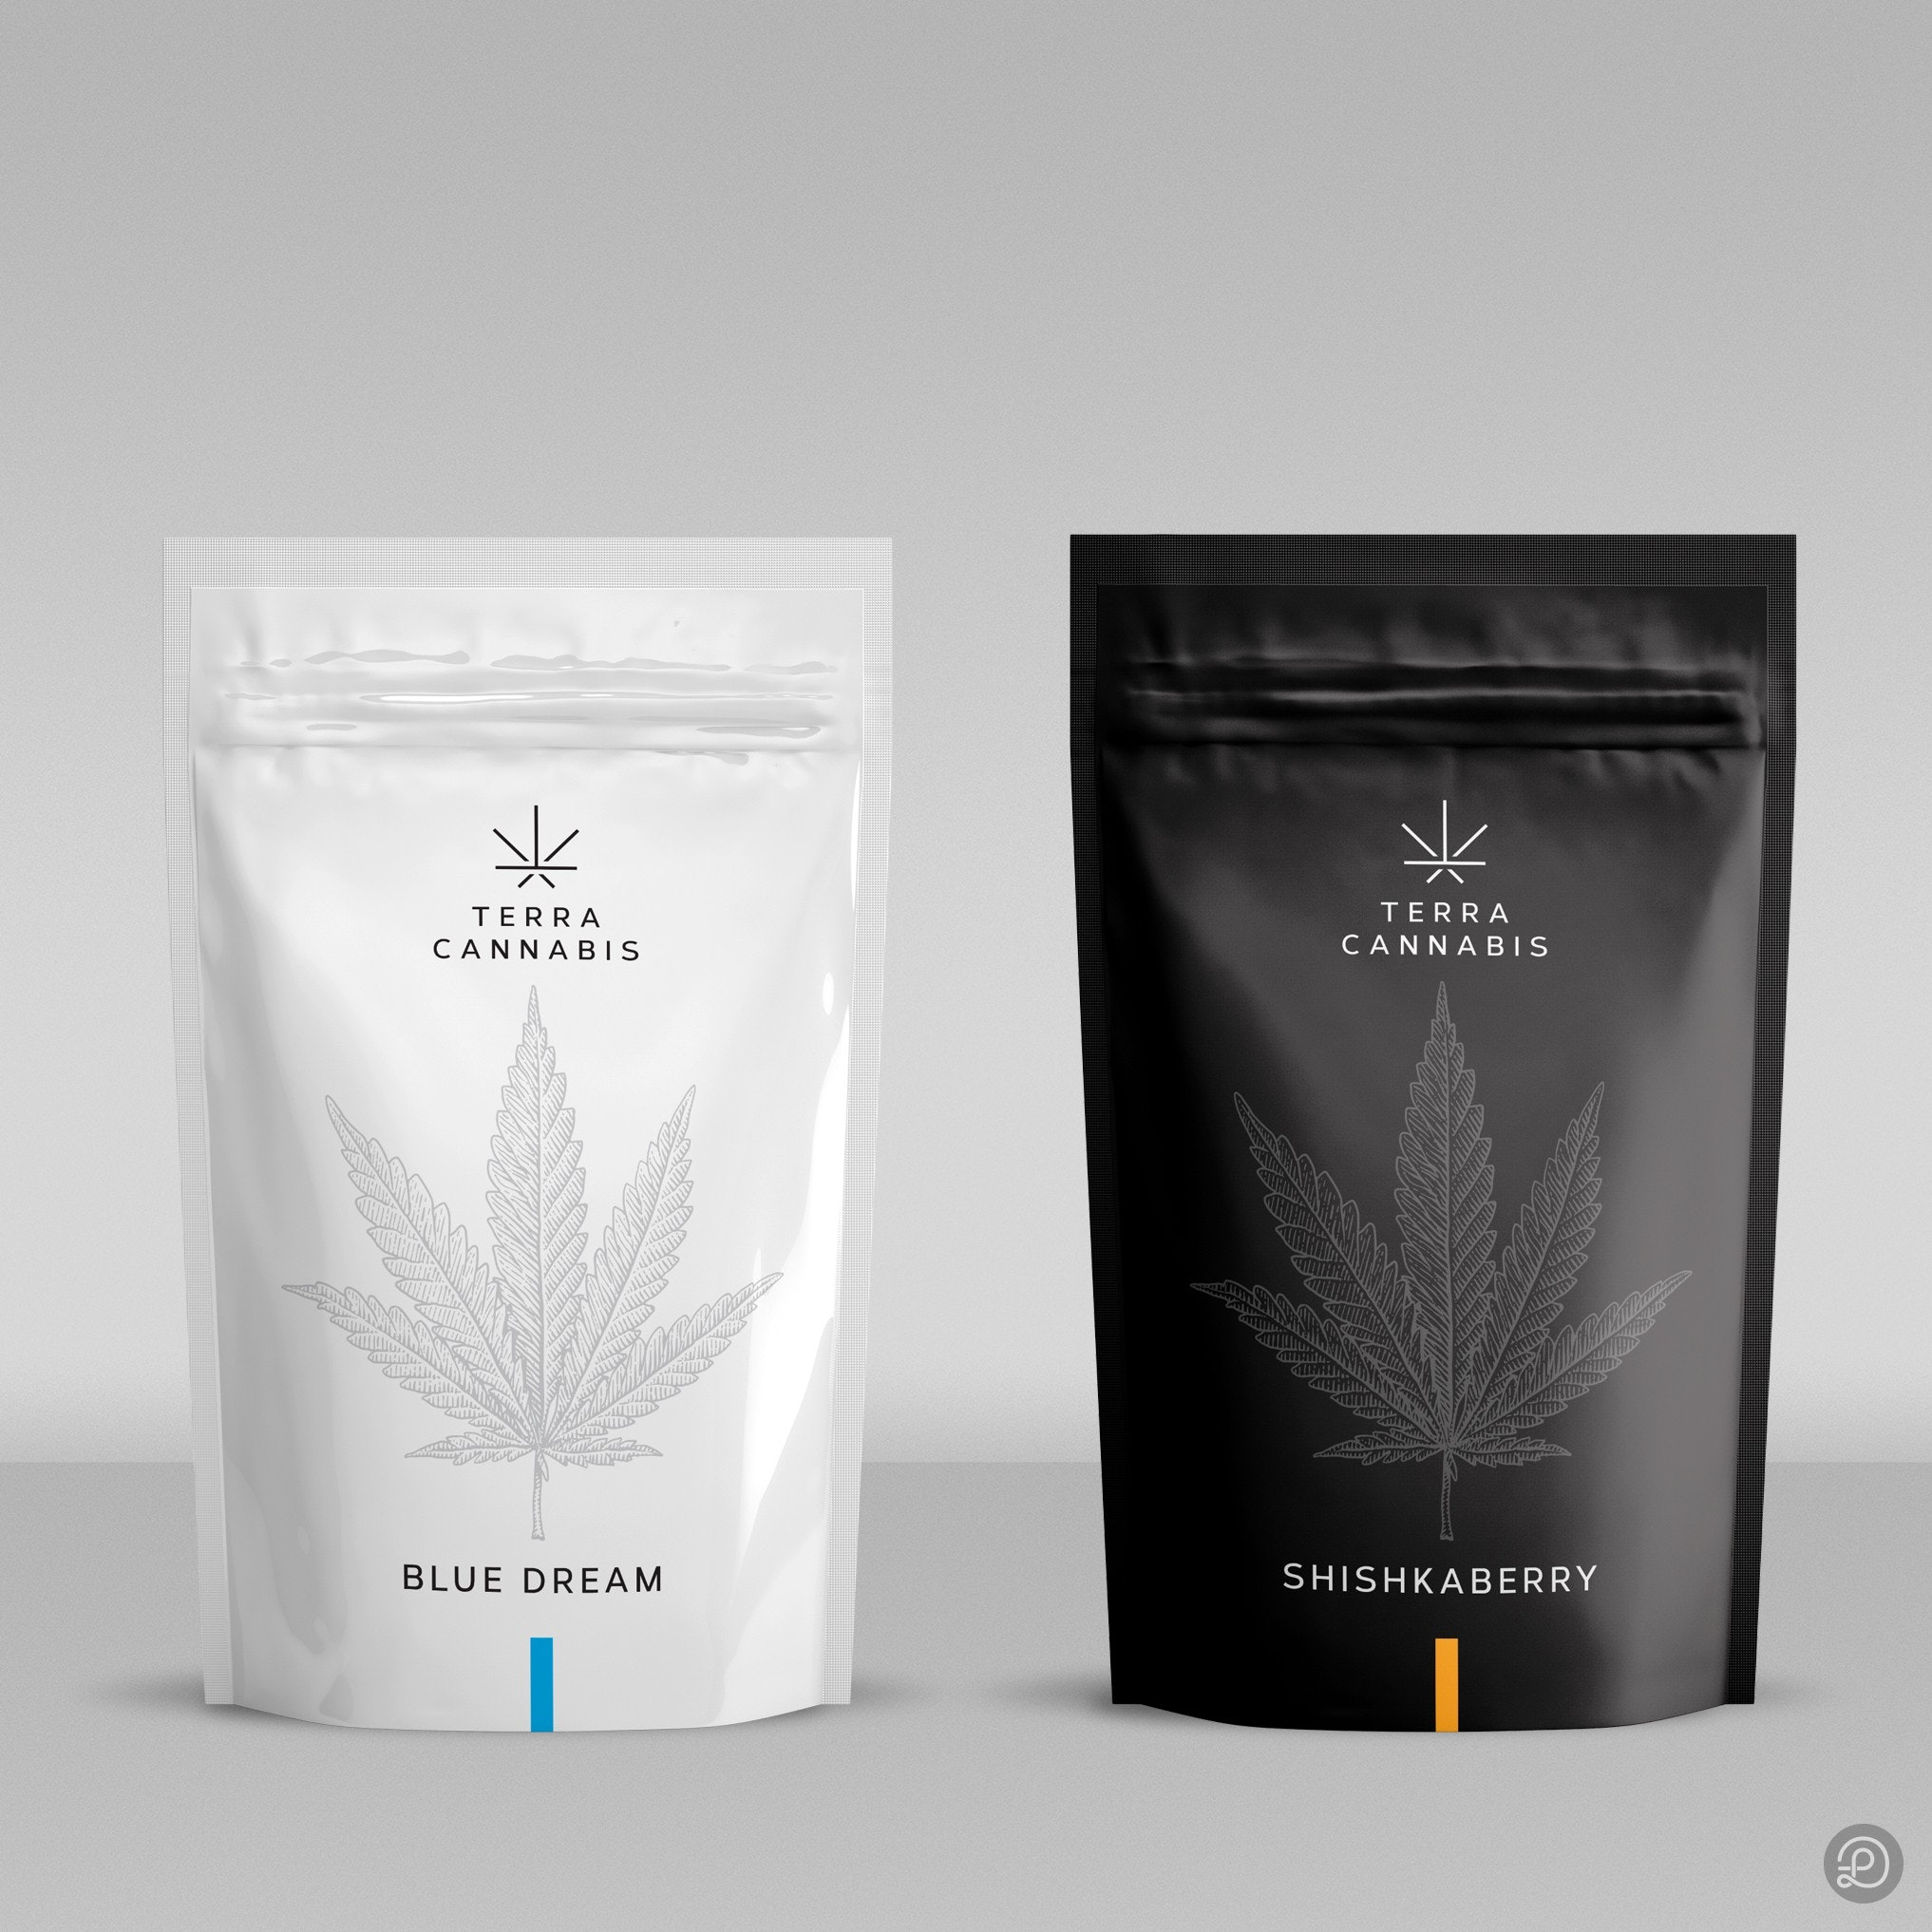 Minimalistic cannabis packaging design